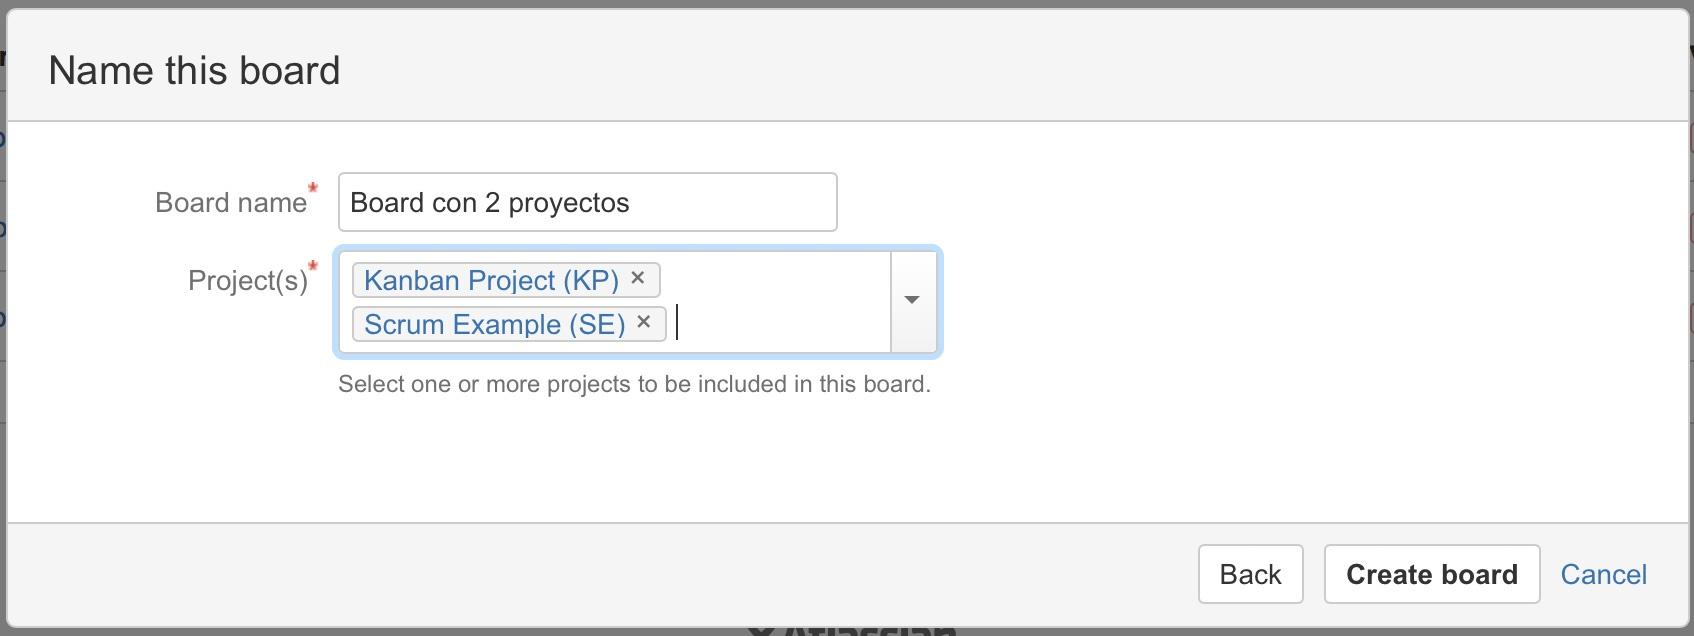 boards_pizarras_tableros_configuracion-scrum-kanban_Jira-software-7-5_Atlassian_DEISER